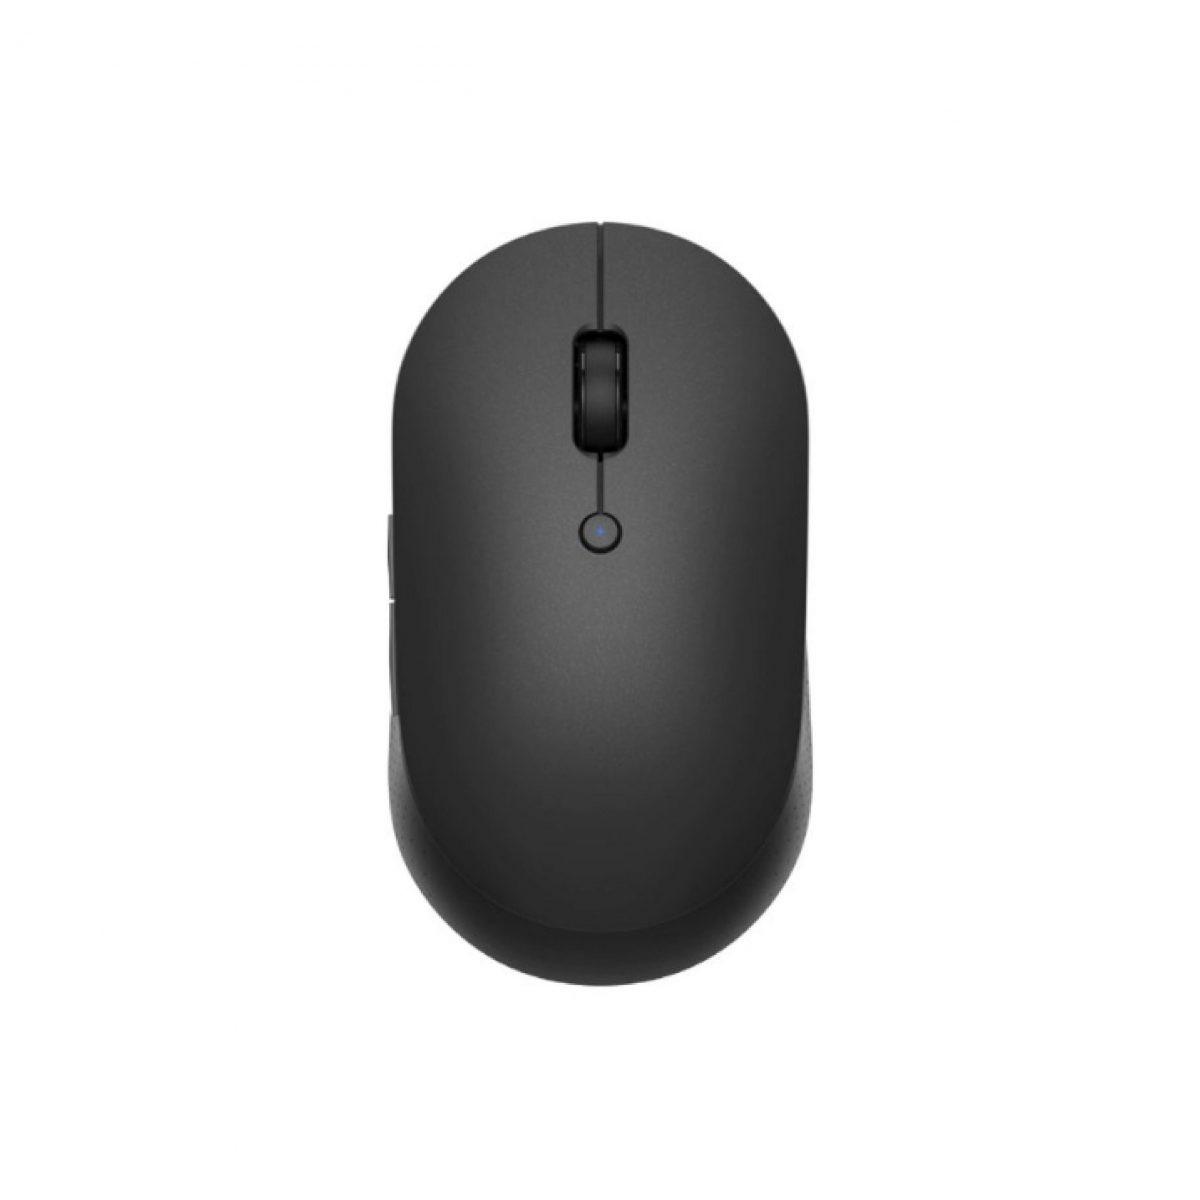 ماوس بیسیم سایلنت شیائومی مدل Mi Dual Mode Wireless Mouse Silent Edition